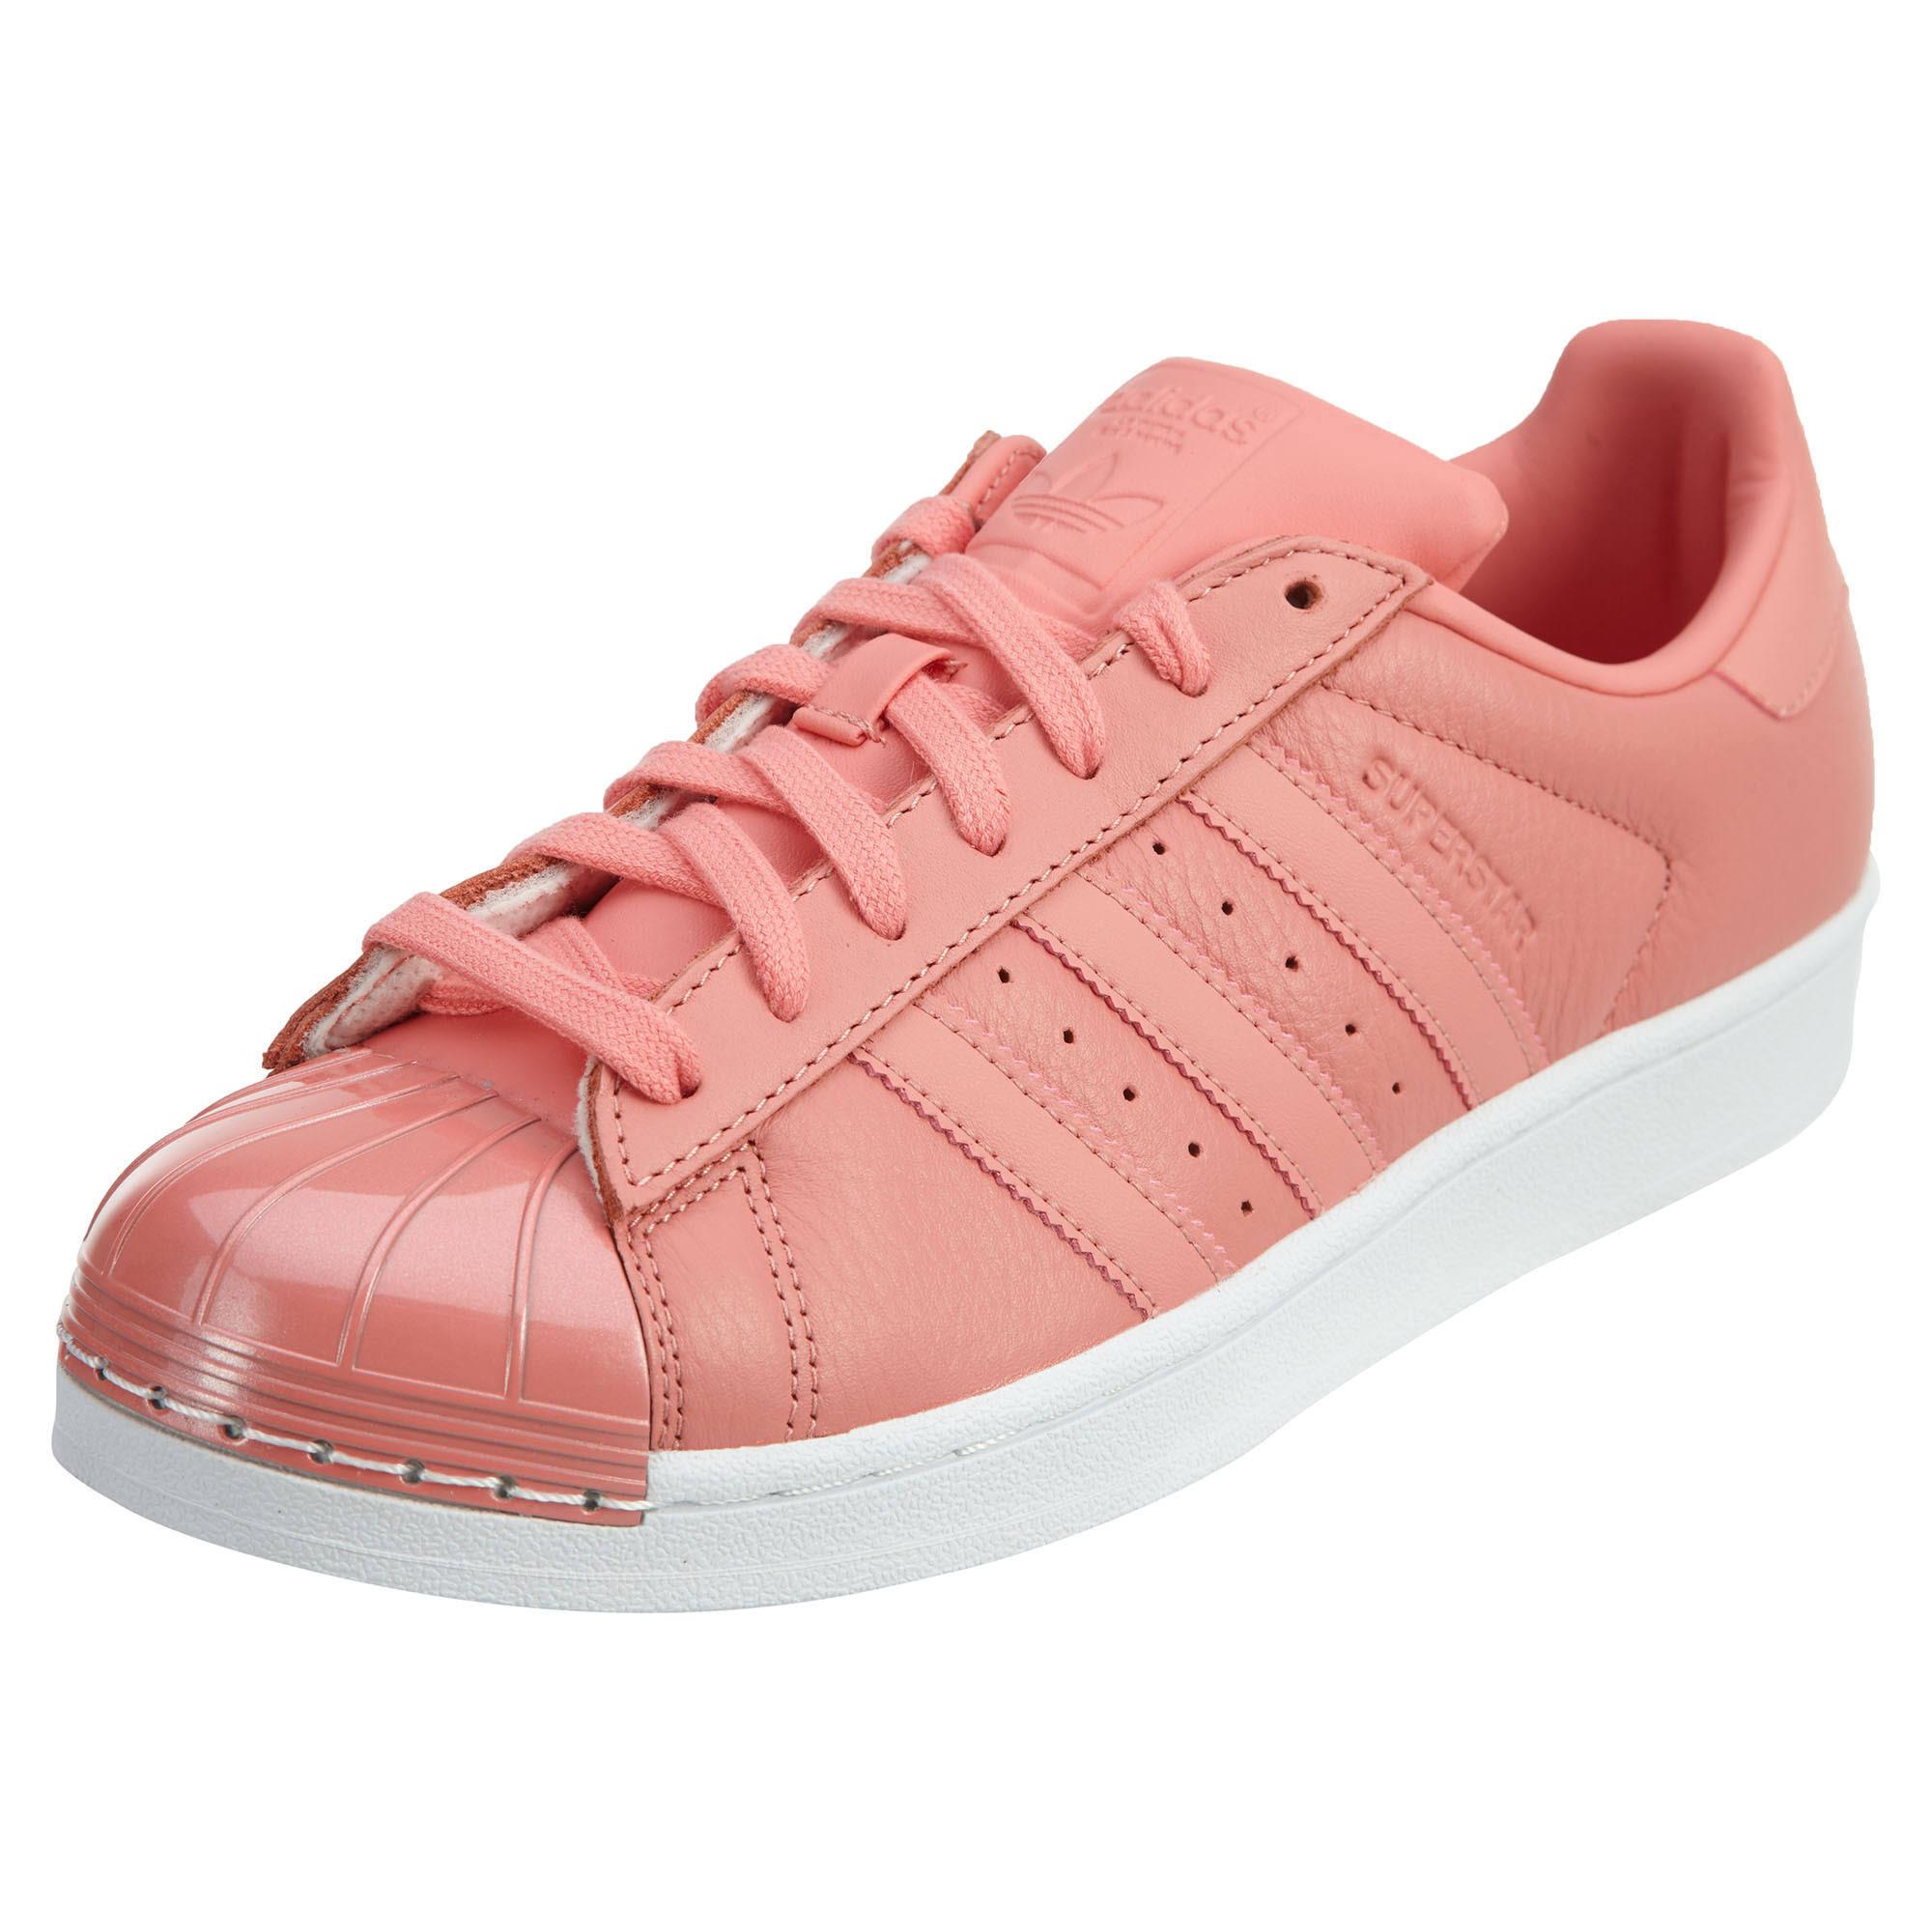 Metal e By9750 Style Toe Tacros Damen Superstar 10 Adidas Pink 5qYwxfBXv